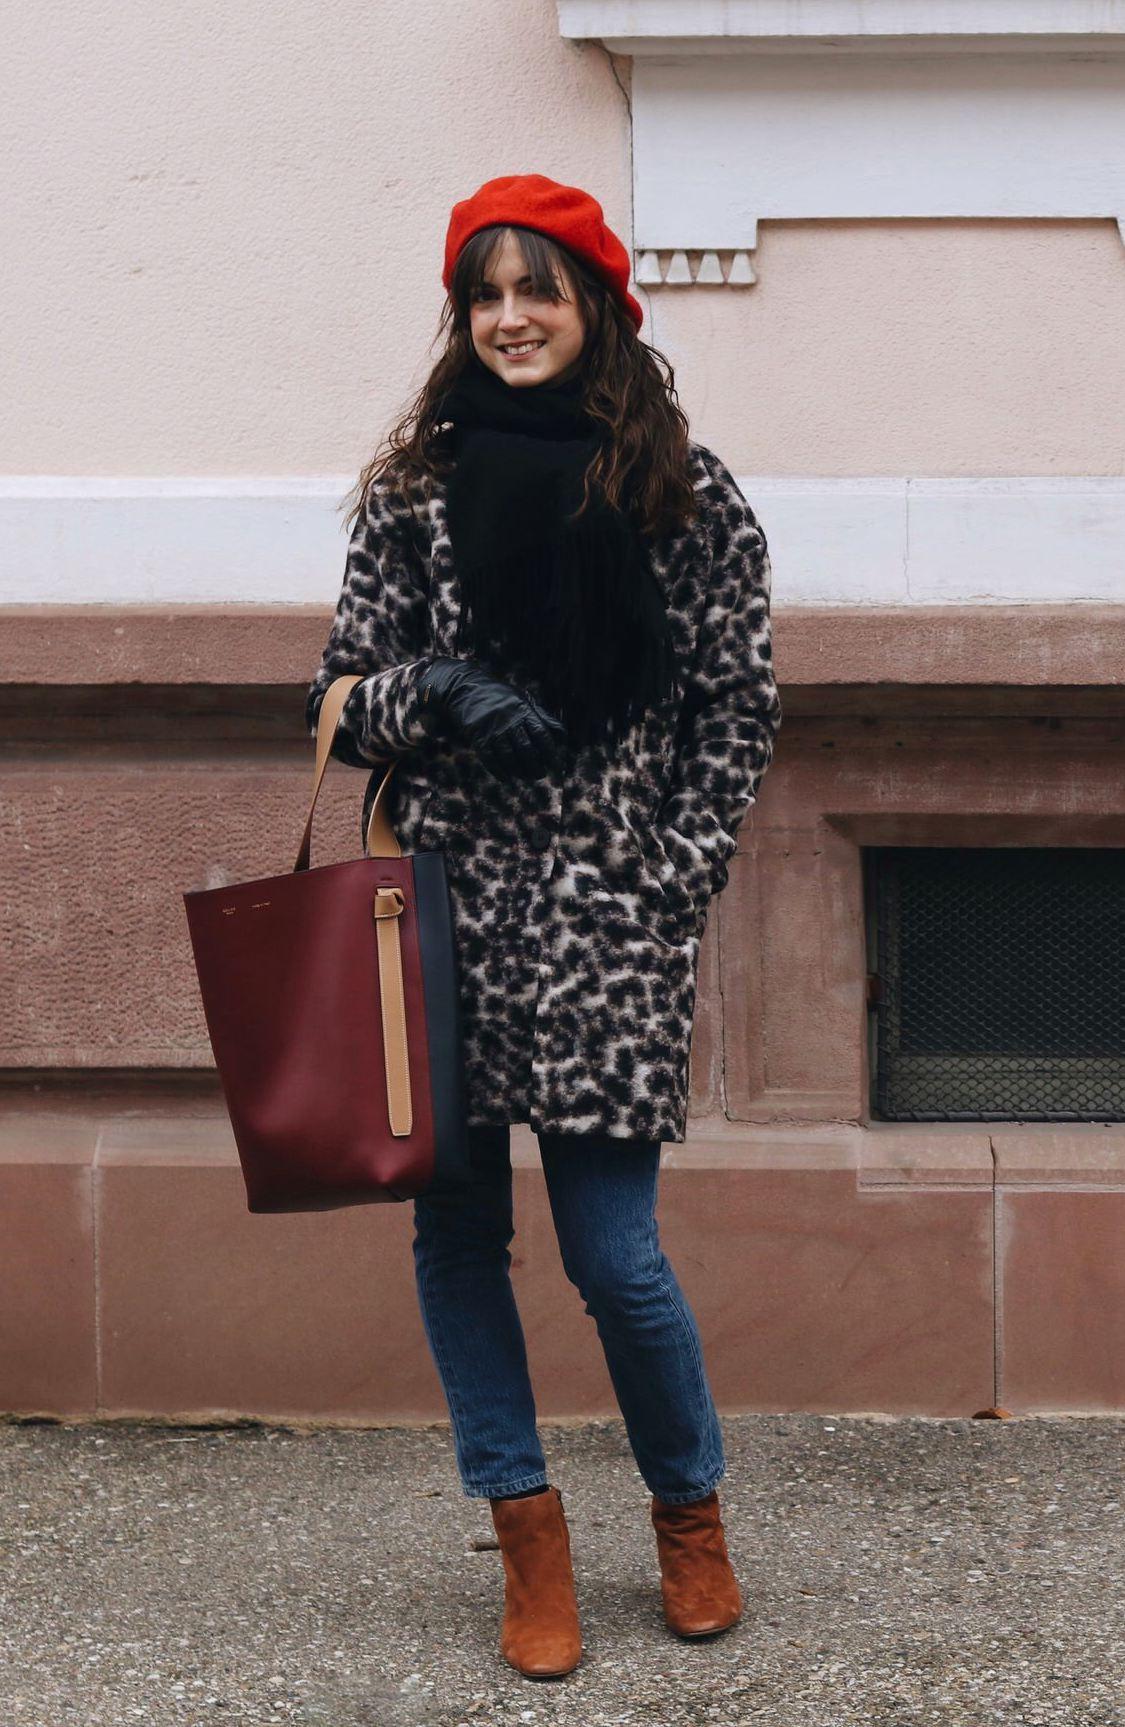 Outfit Post Mode Blog Leomantel Celine Tasche Stiefeletten Neele Bloggerin